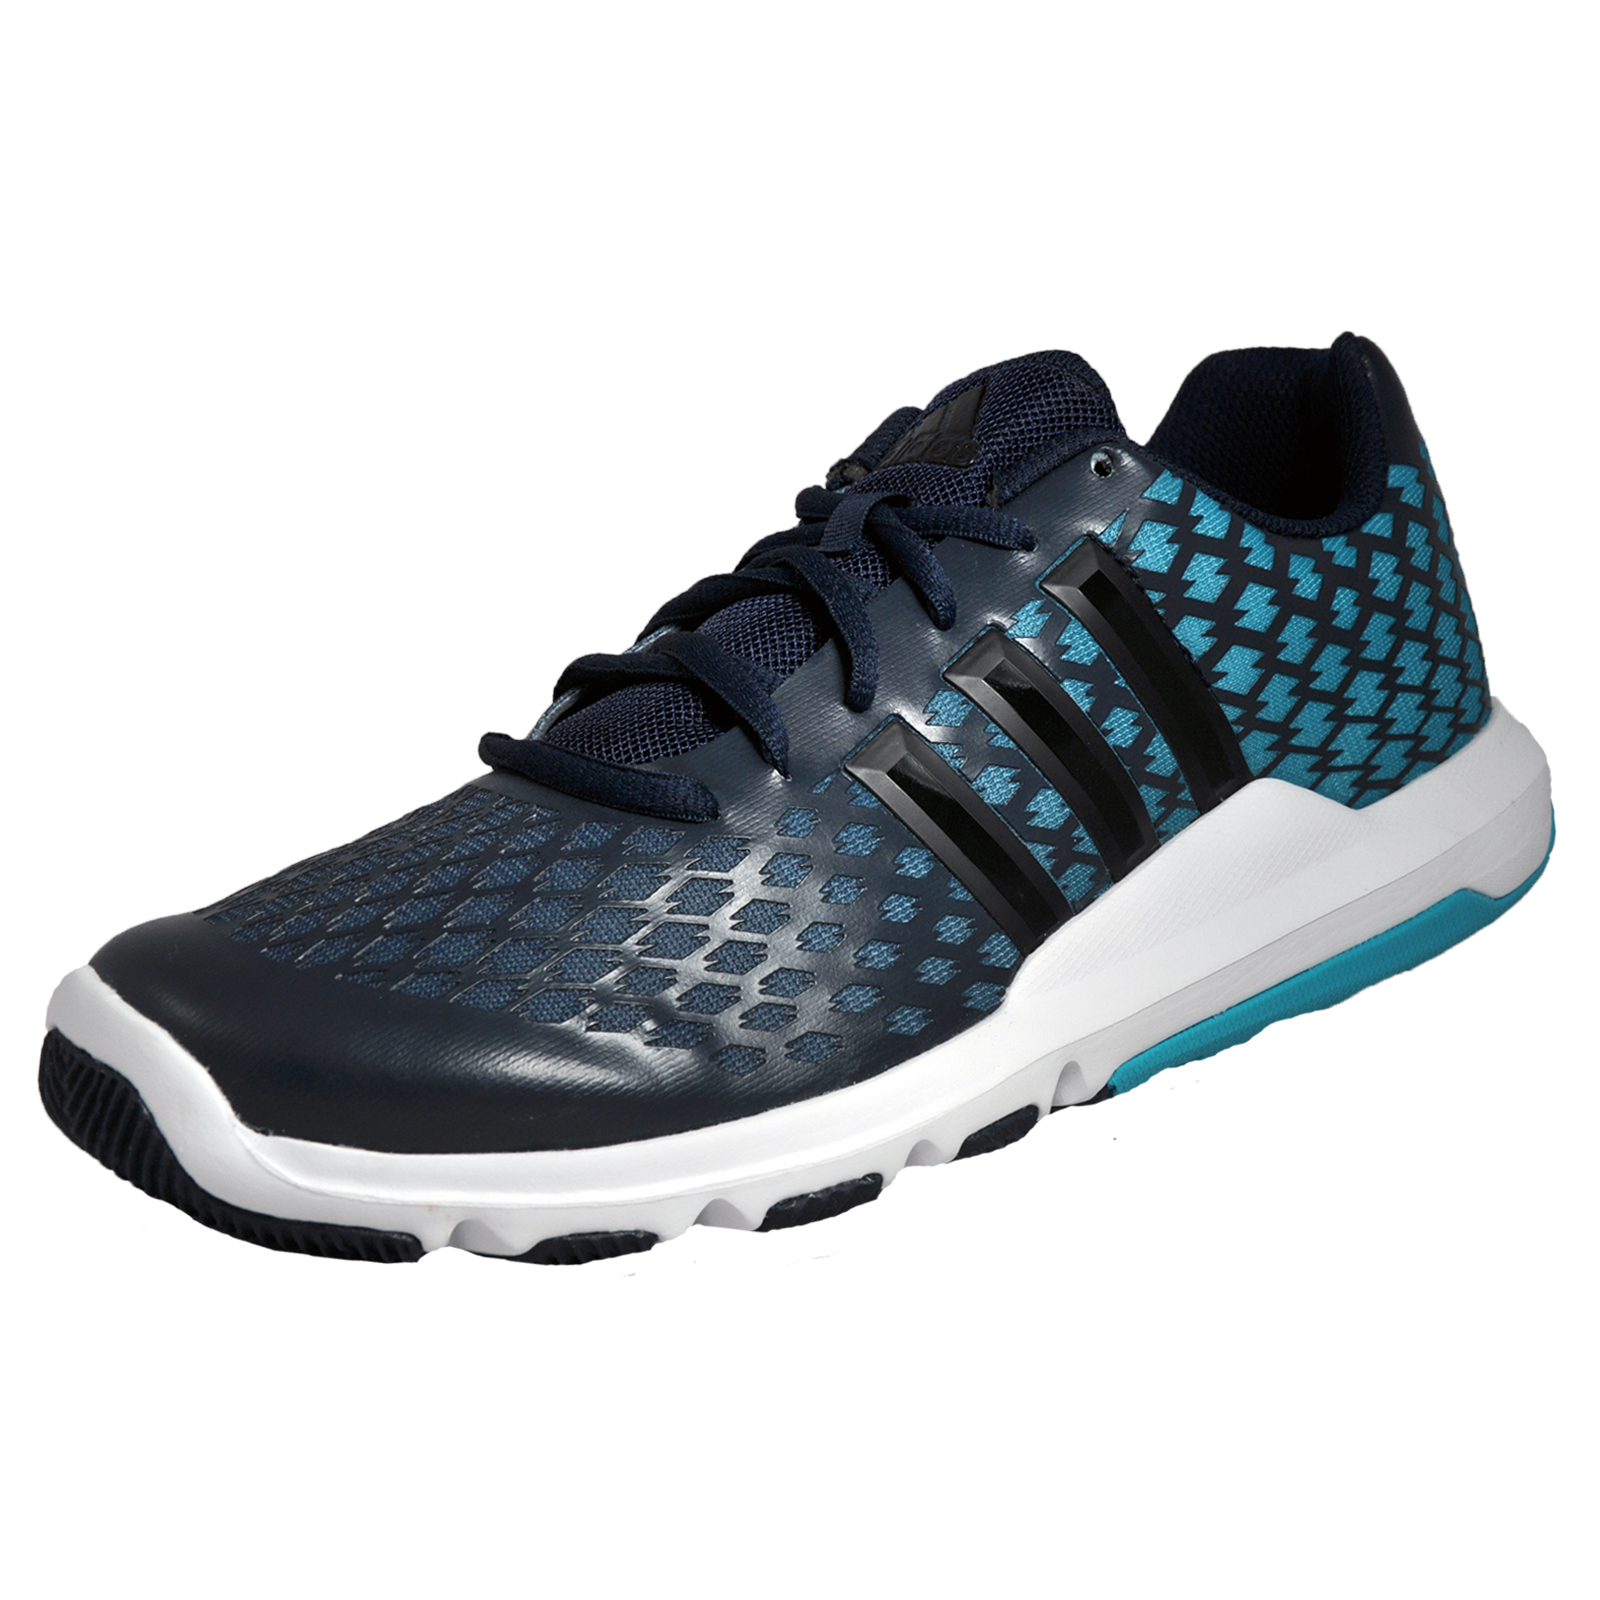 adidas adipure mens running shoes